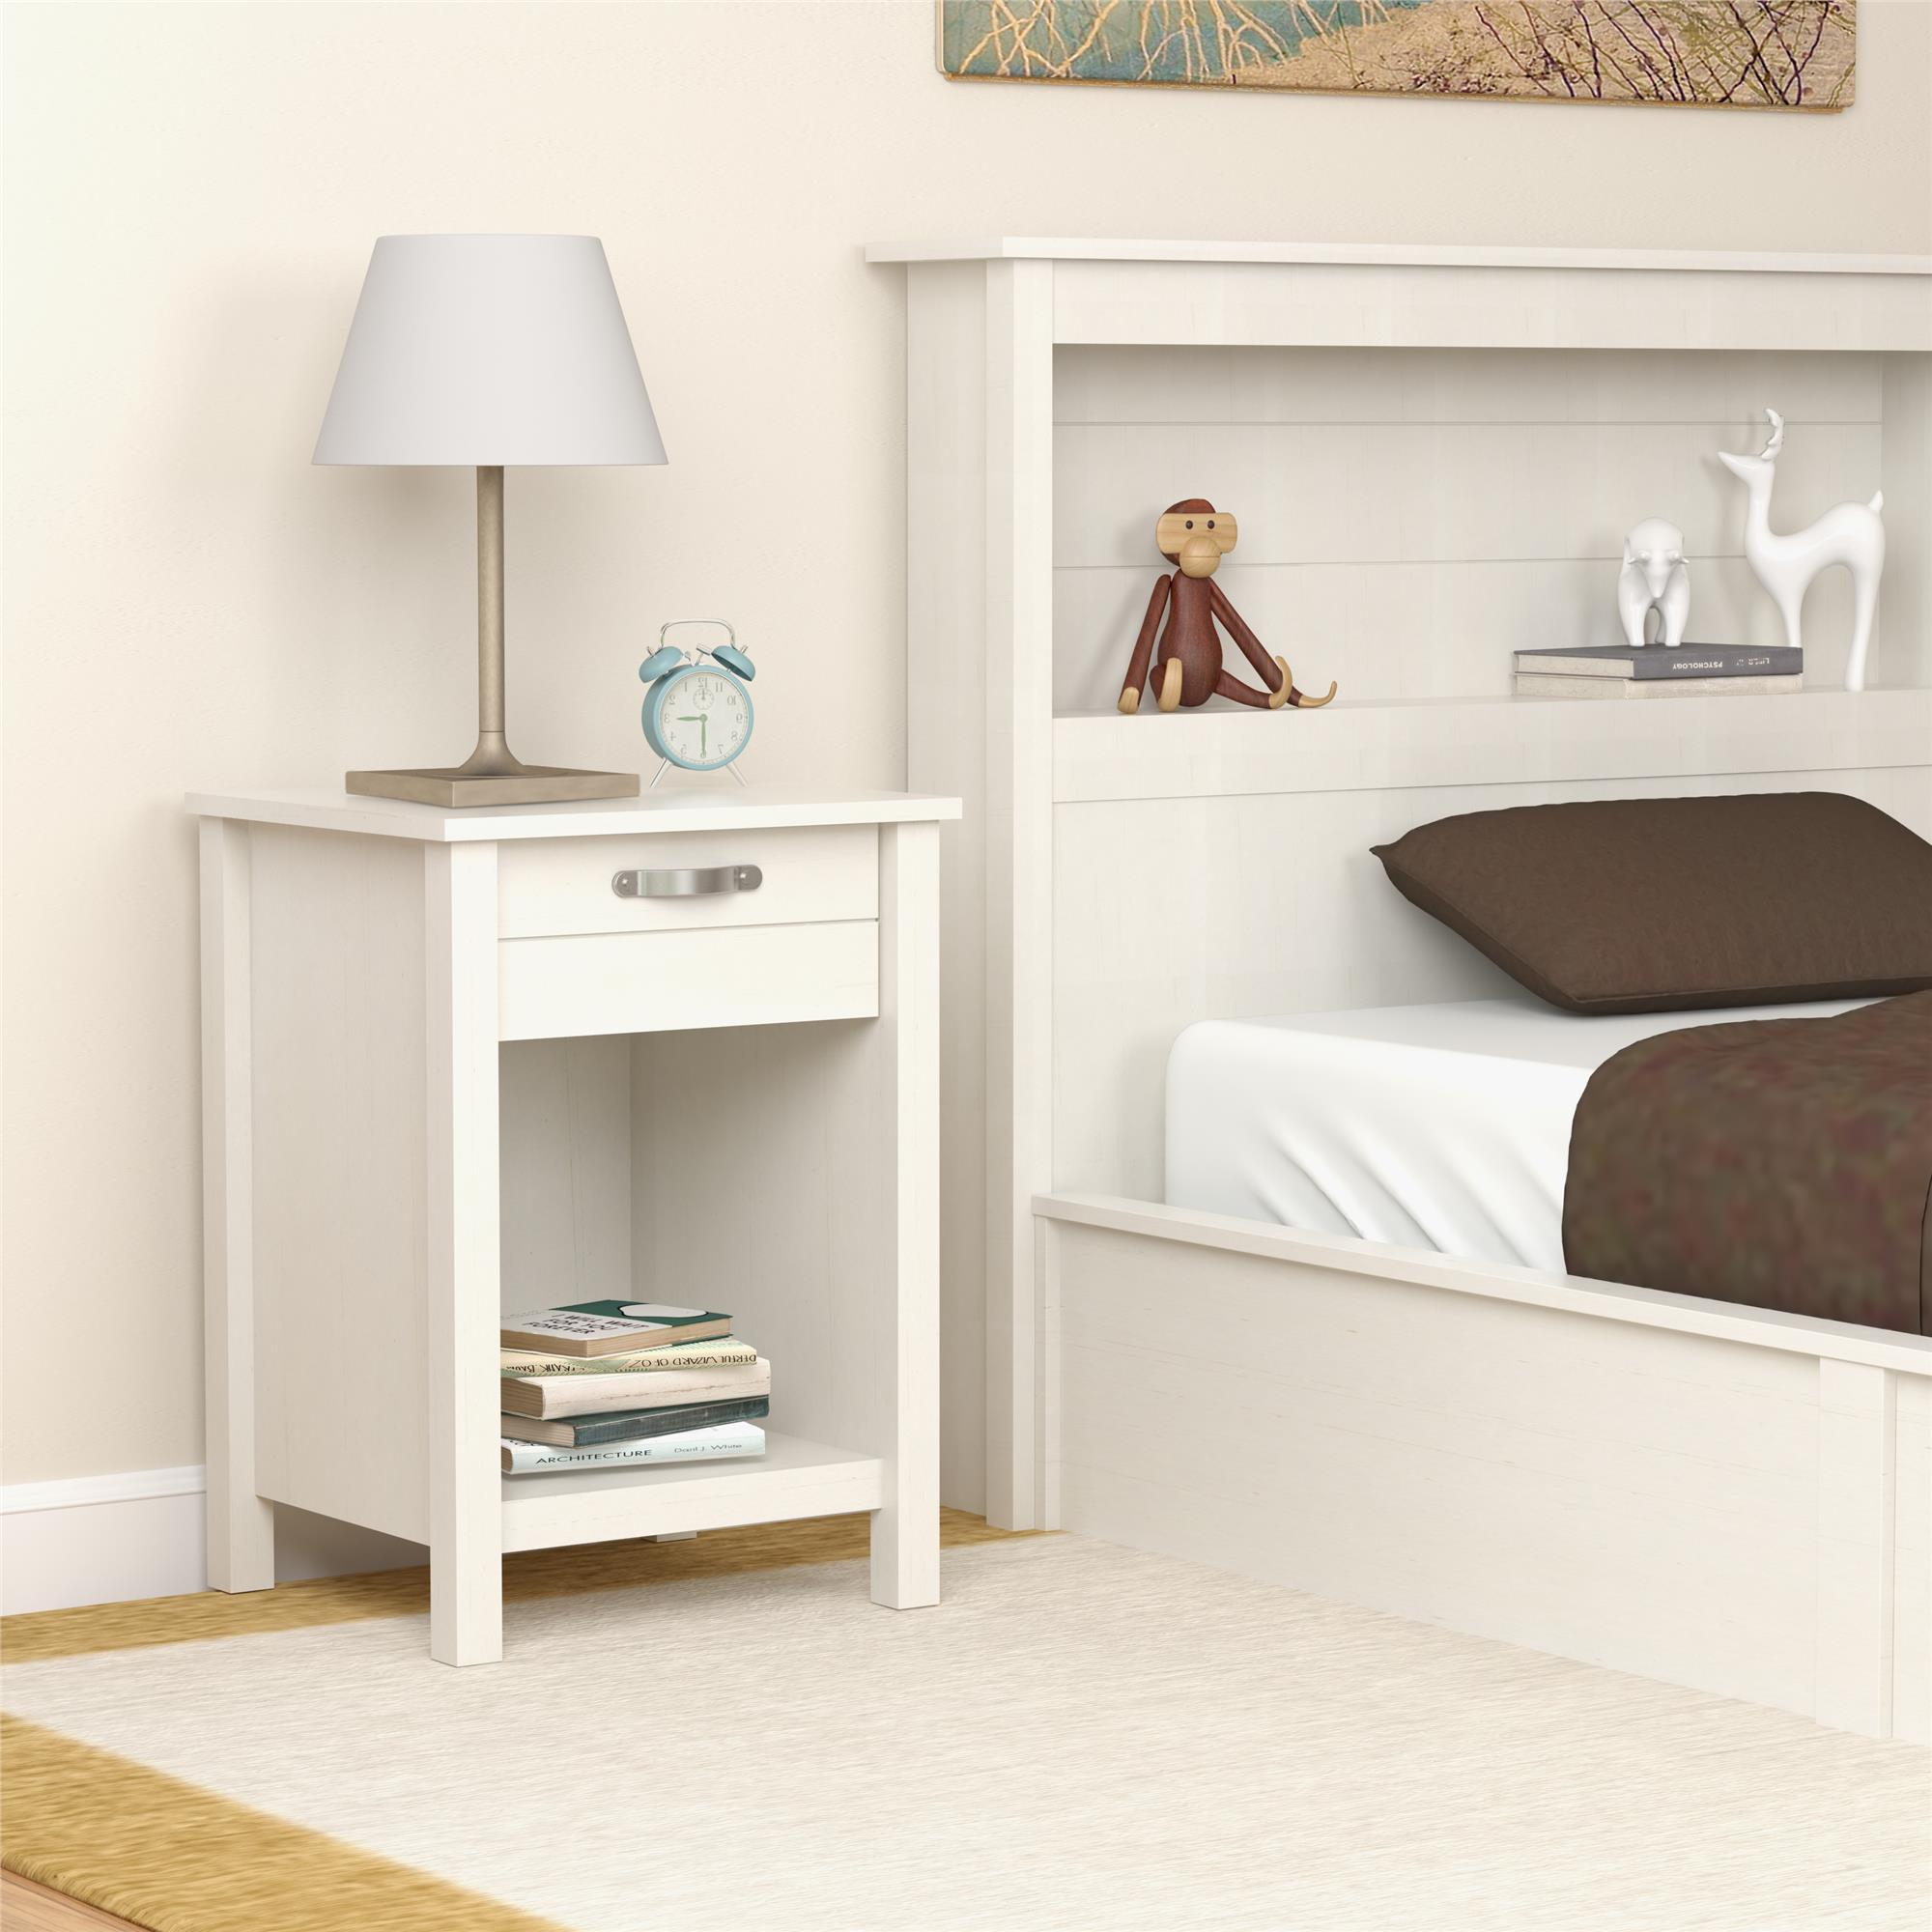 bookcase frame nightstands size with shelf headboards headboard oak floating tall bed storage queen